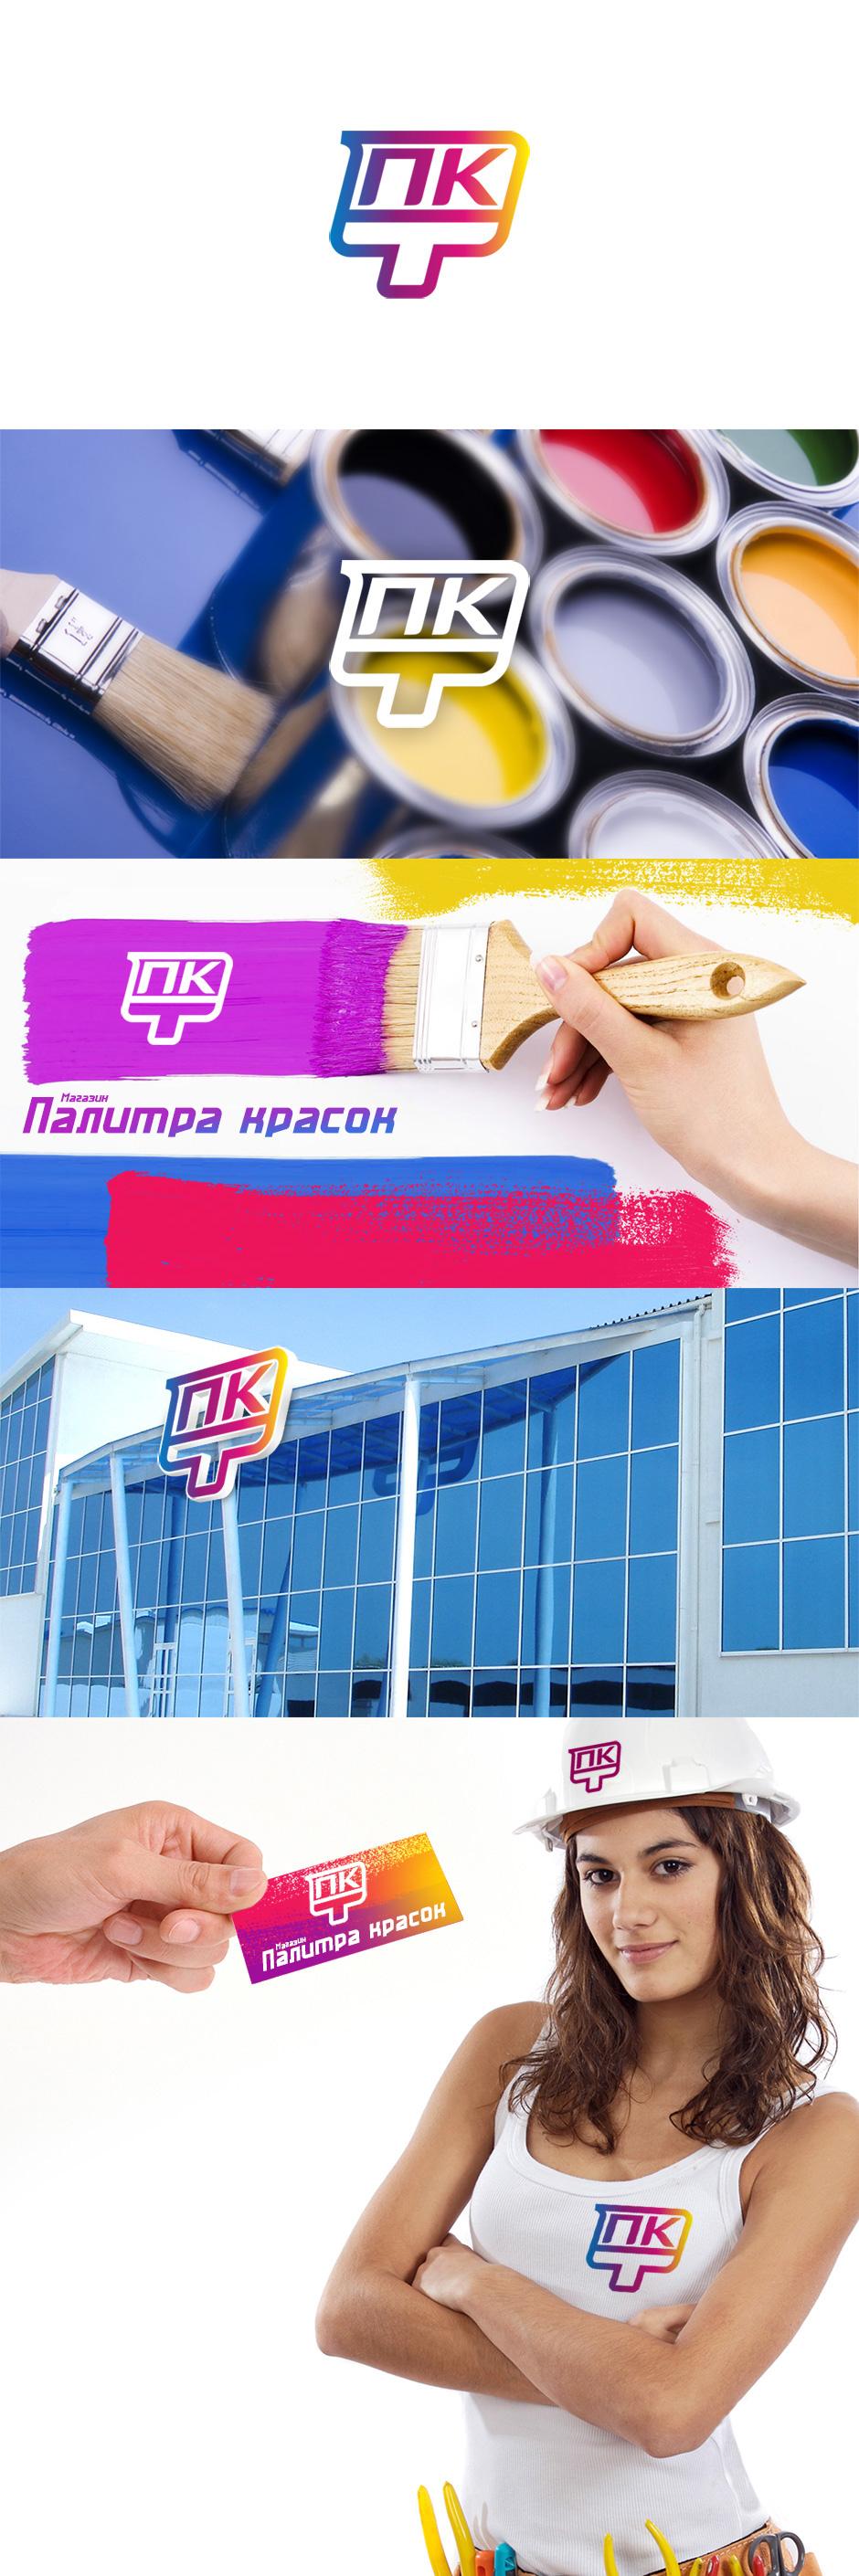 Логотип магазина «Палитра красок»